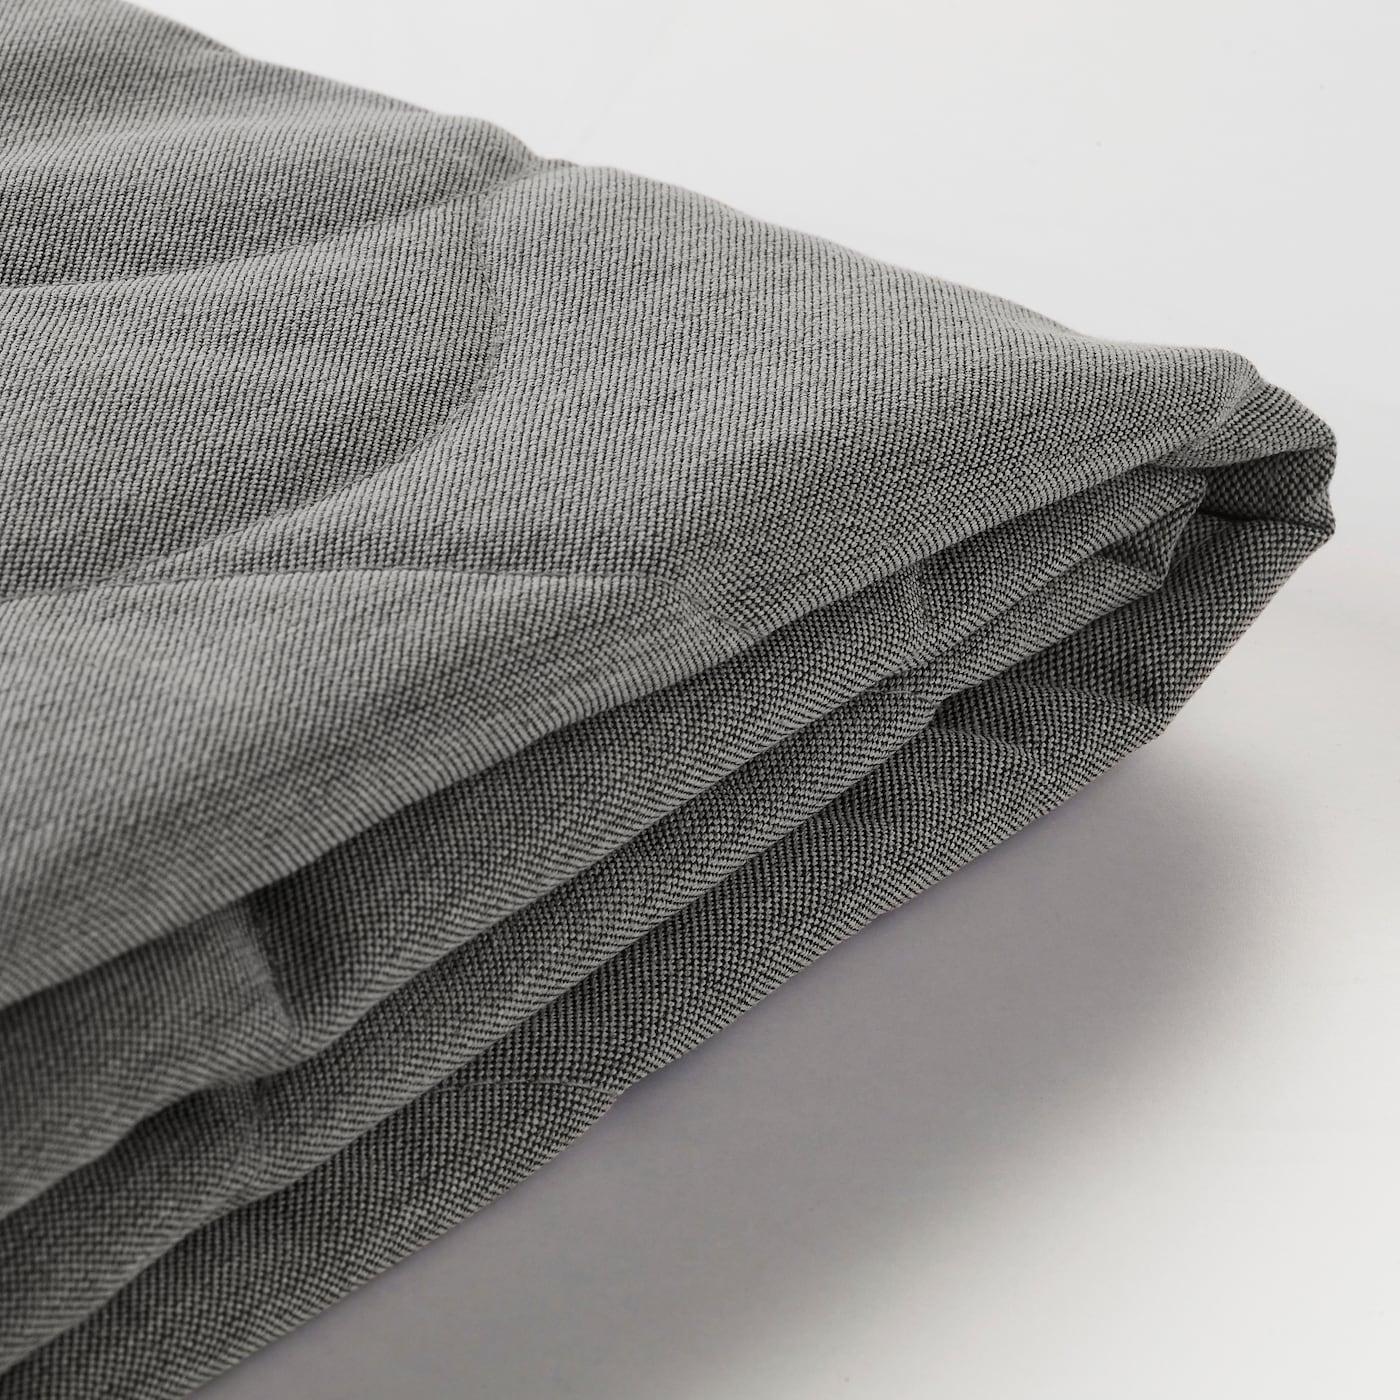 Ikea Beddinge Slaapbank Grijs.Nyhamn Three Seat Sofa Bed Cover Knisa Grey Beige Ikea